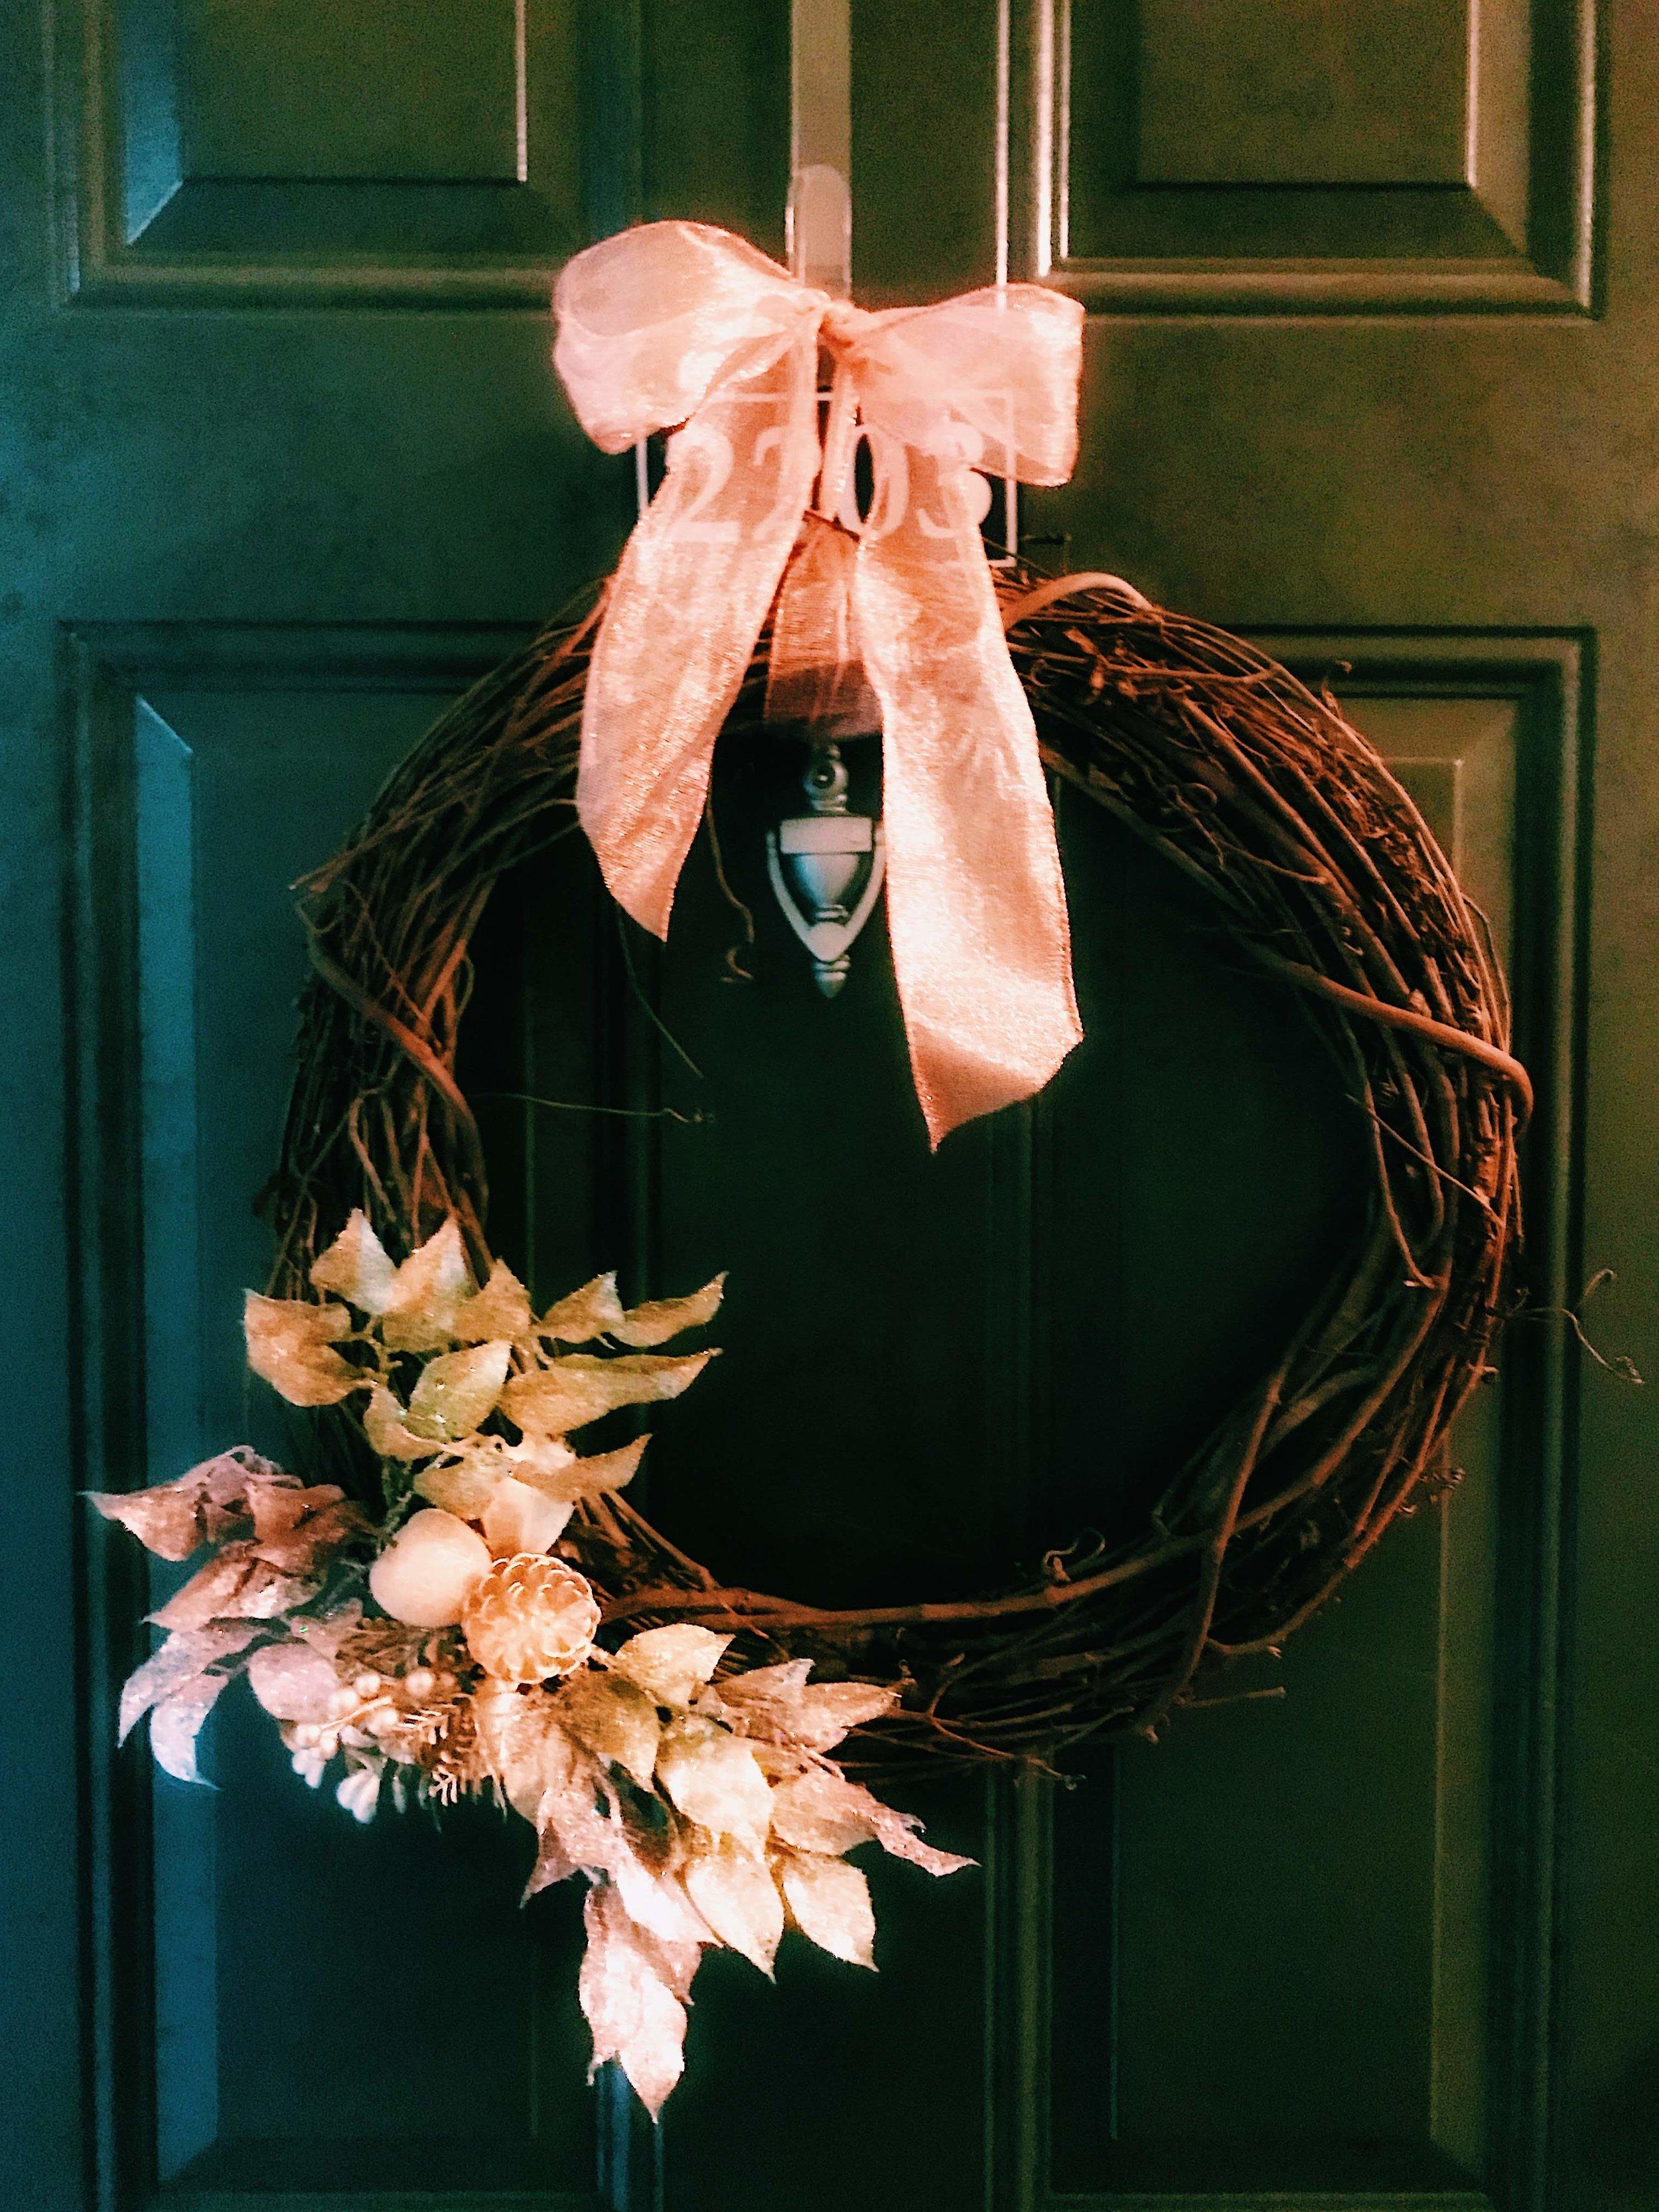 Three Heel Clicks - How to Make a Classy Holiday Wreath for $20 (13).jpg